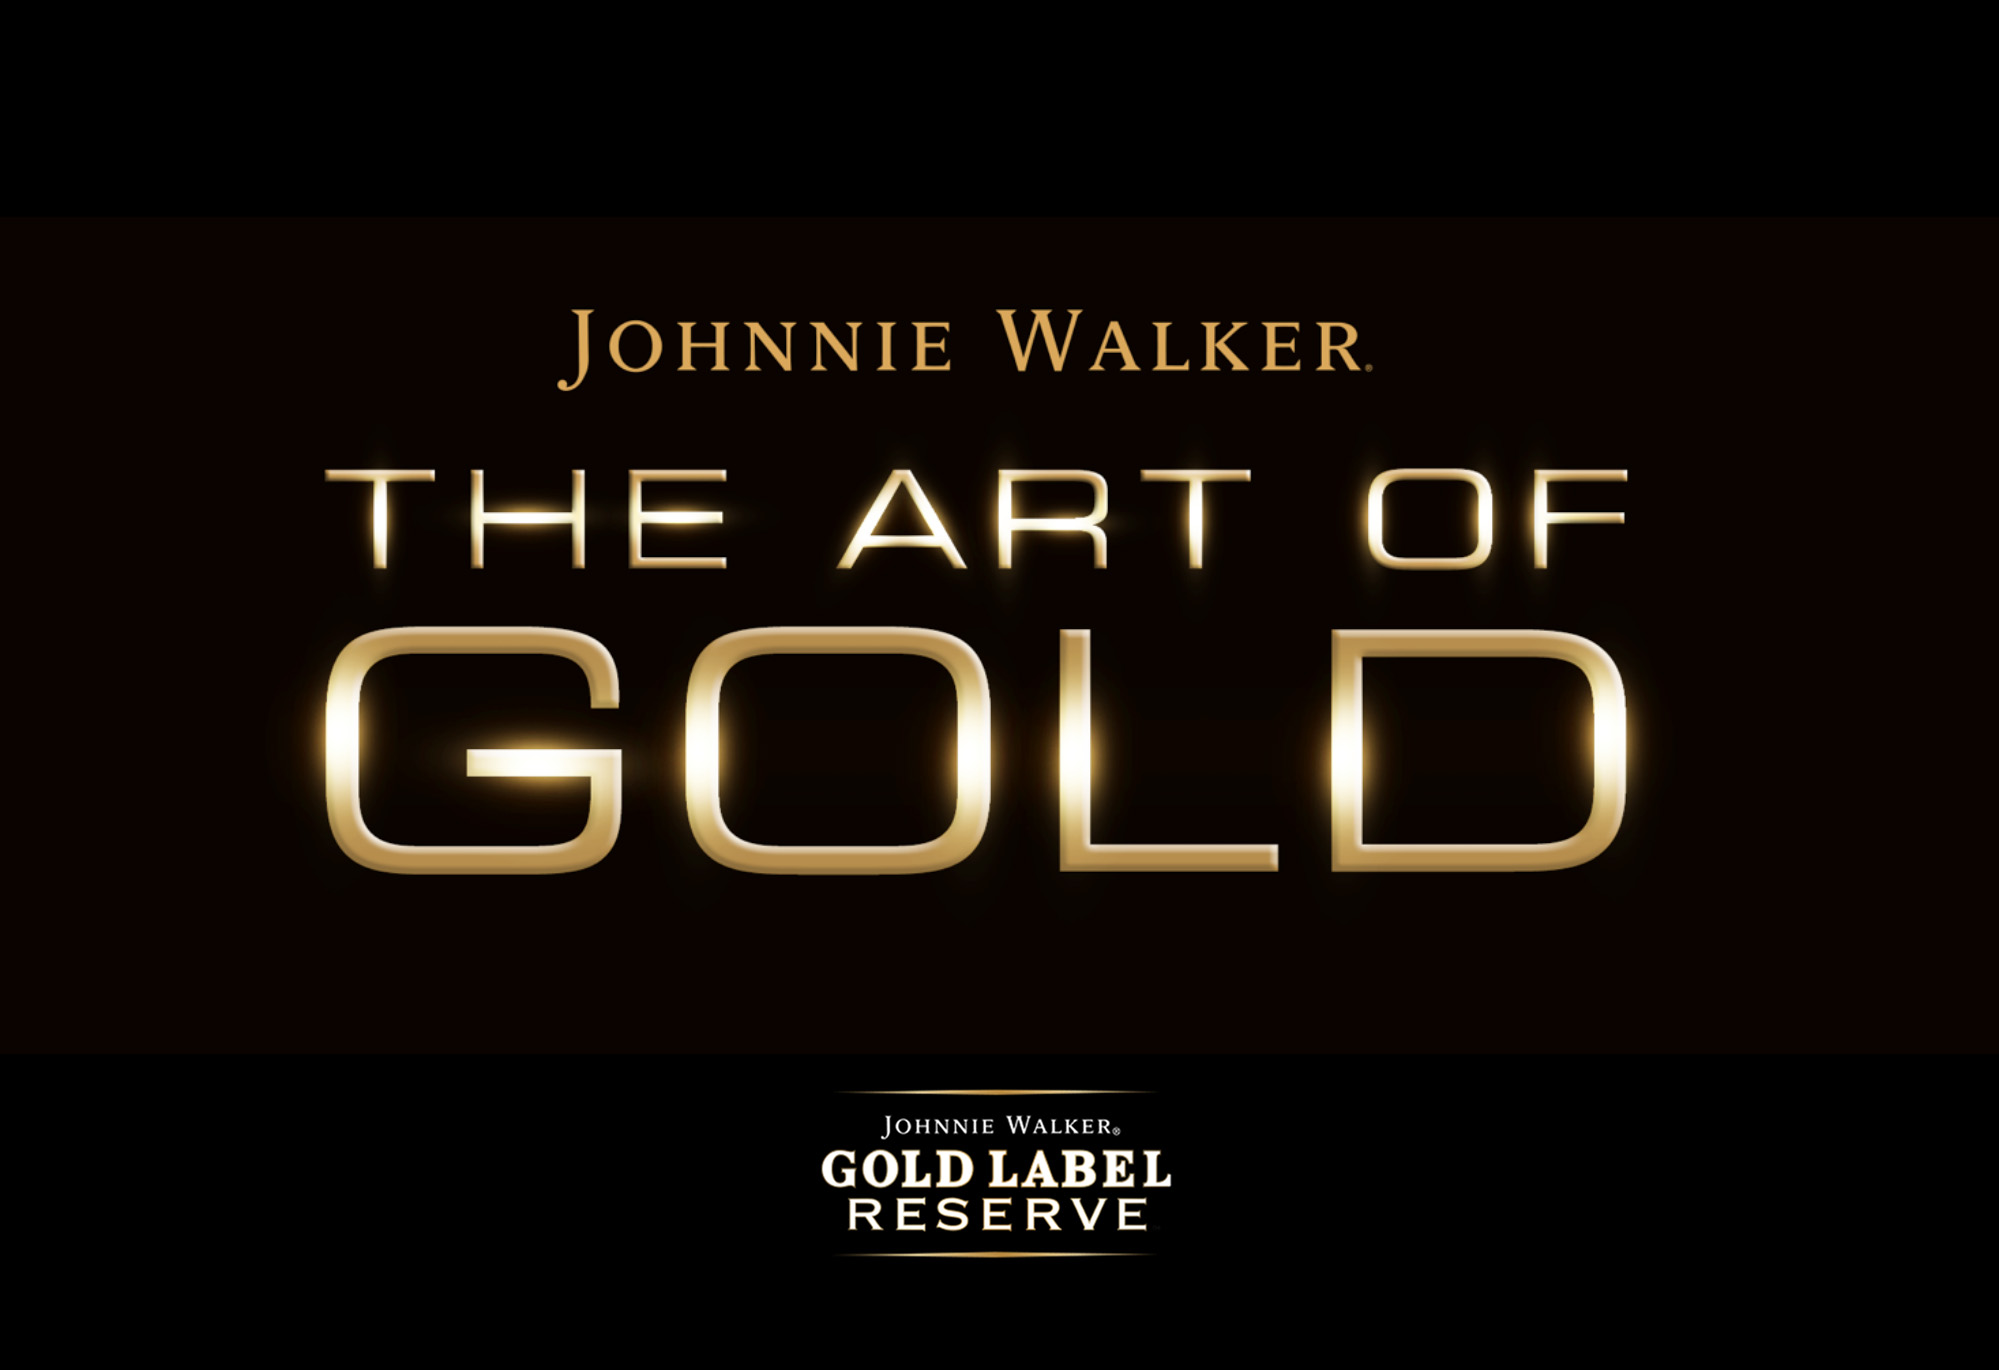 Johnnie Walker The Art of Gold logo